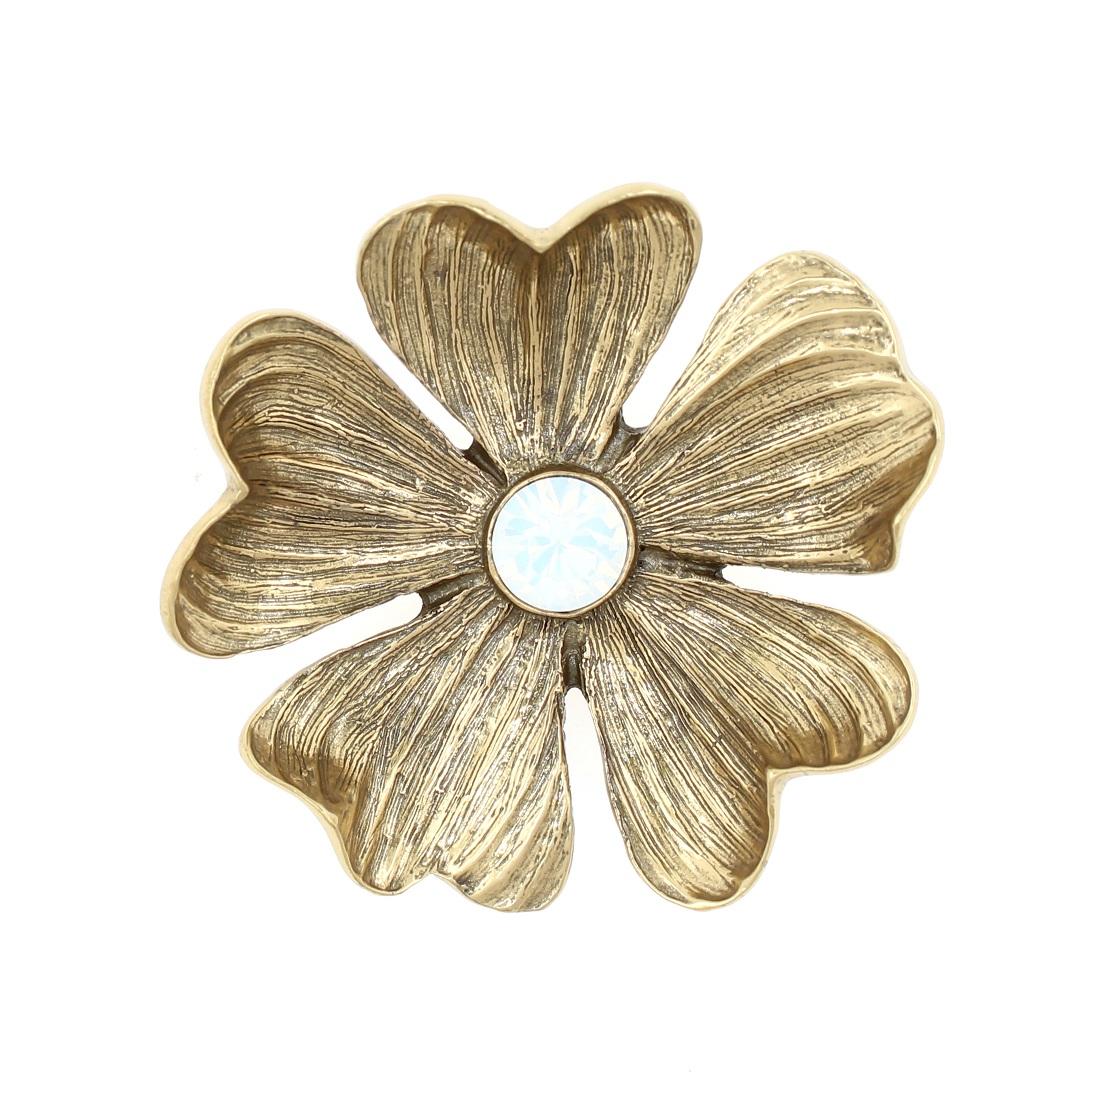 PILGRIM - Autumn's Finest - Flower Brooch - Gold/White BNWT